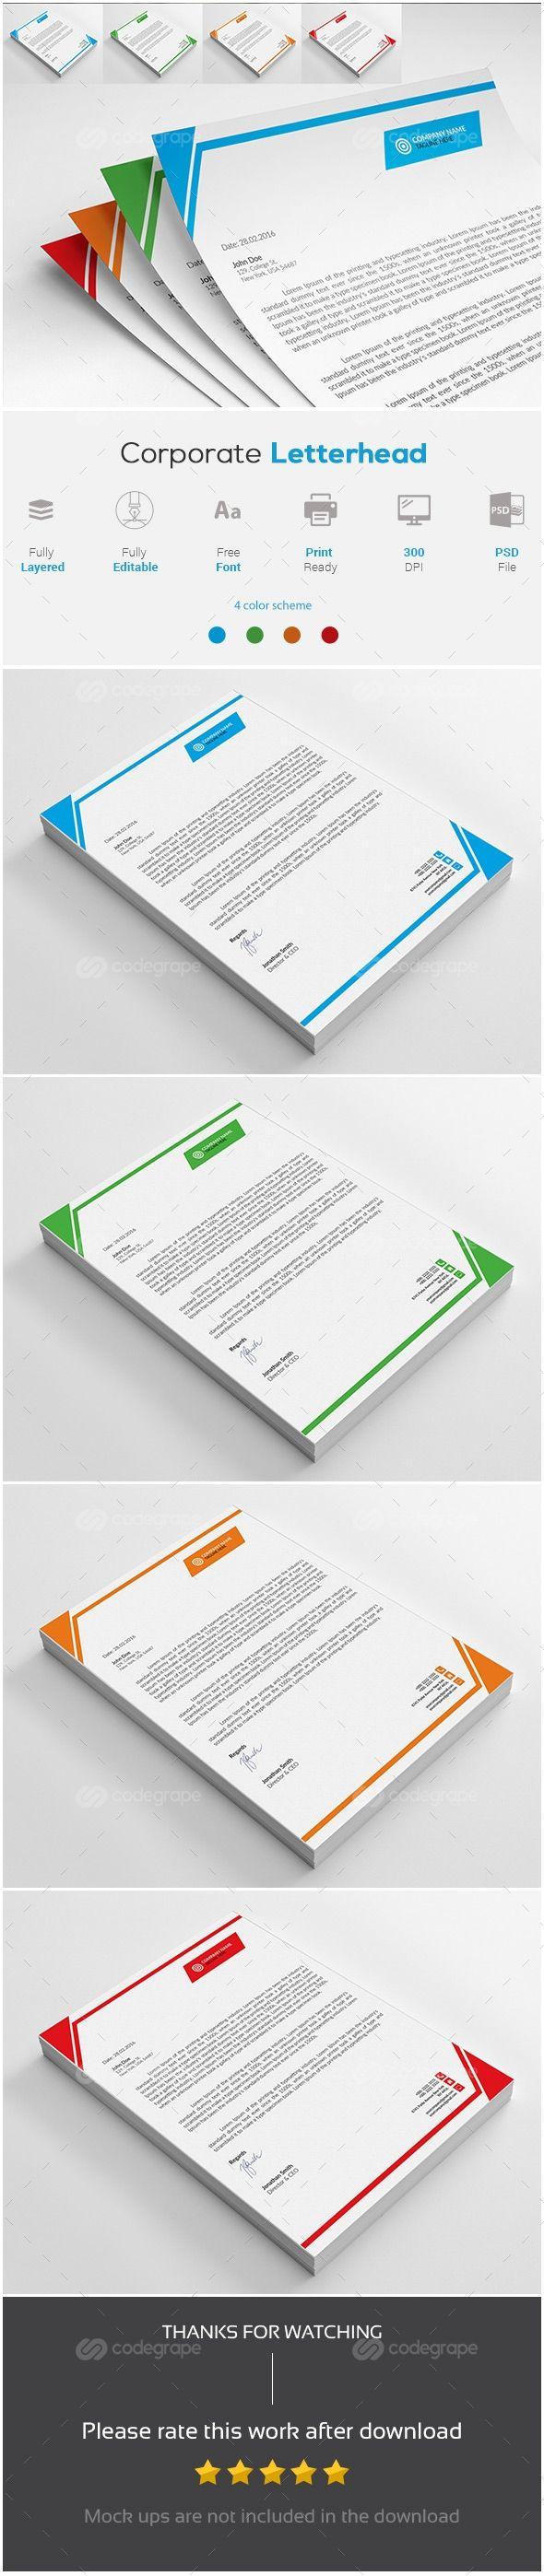 Corporate Letterhead - http://www.codegrape.com/item/corporate-letterhead/8106